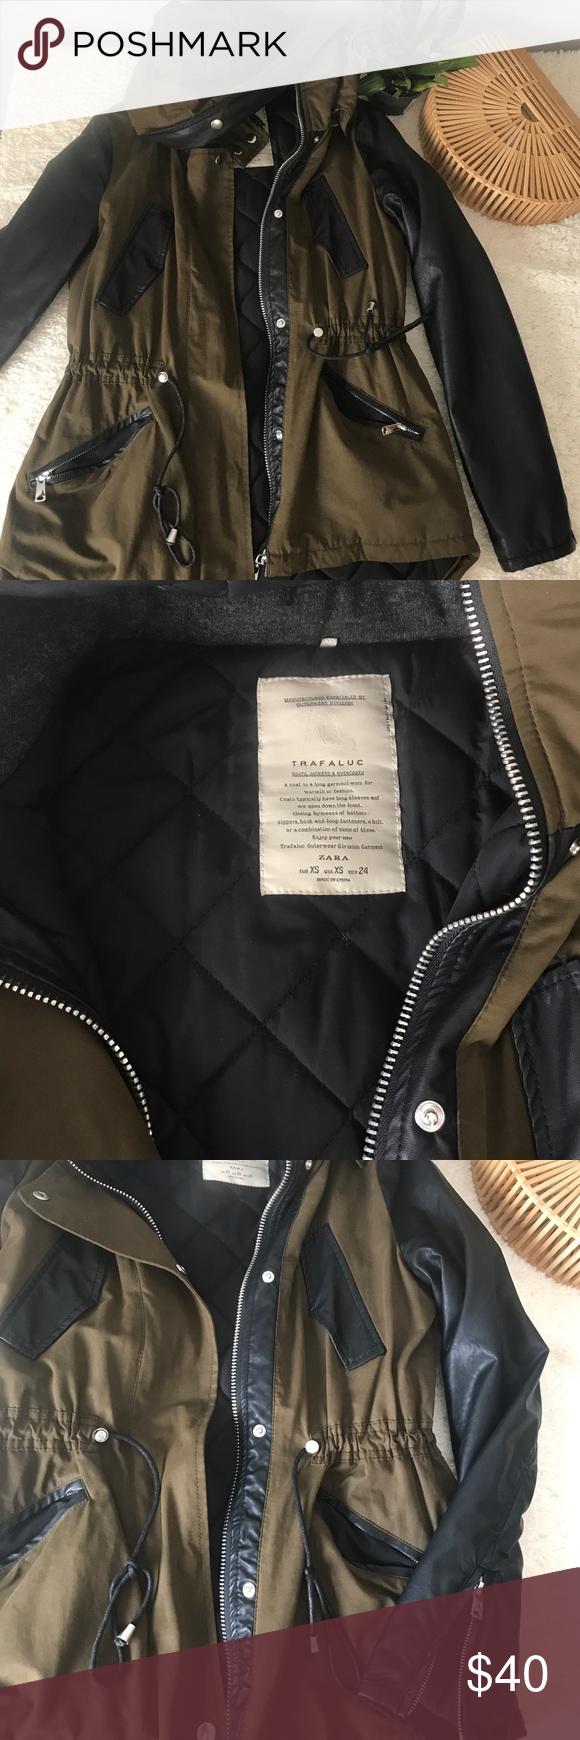 Zara Trafaluc Jacket Fashion Clothes Design Jackets [ 1740 x 580 Pixel ]